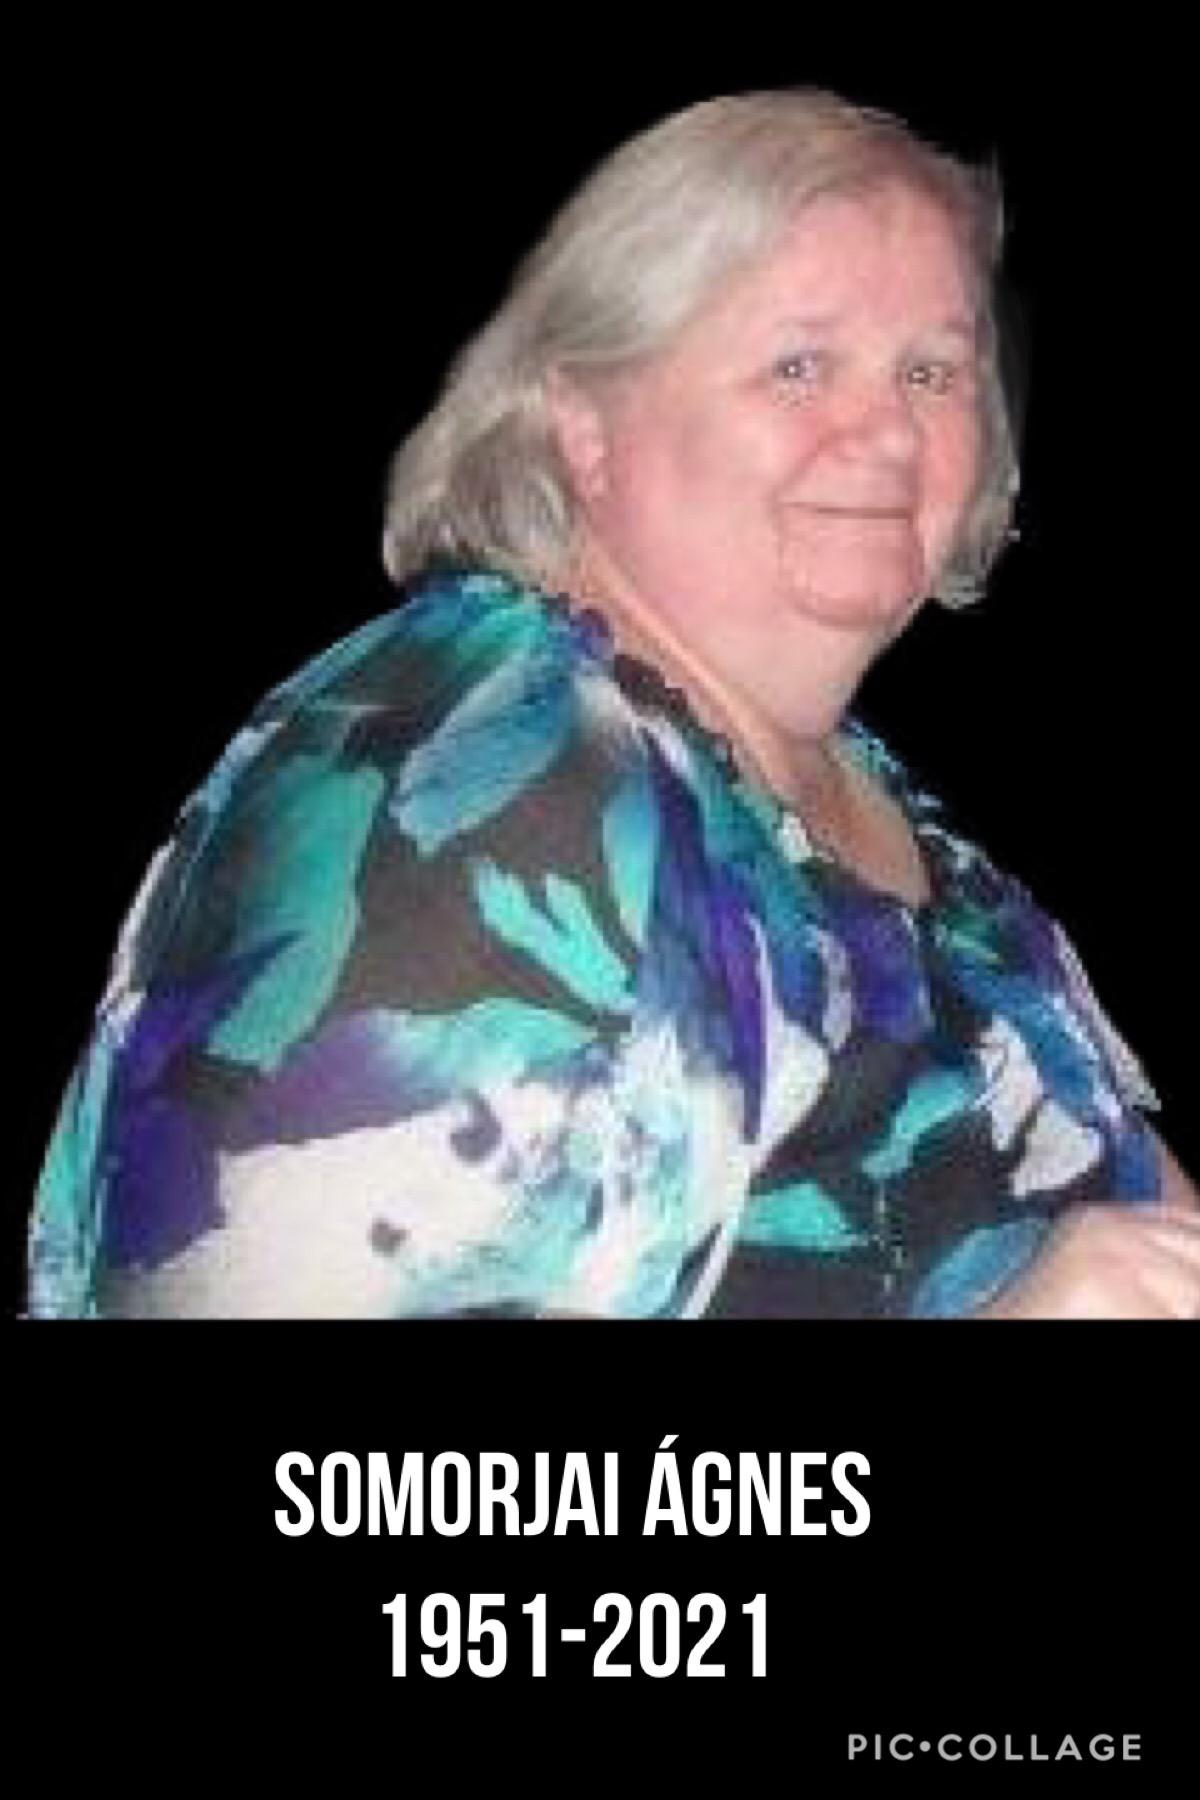 néhai Somorjai Ágnes